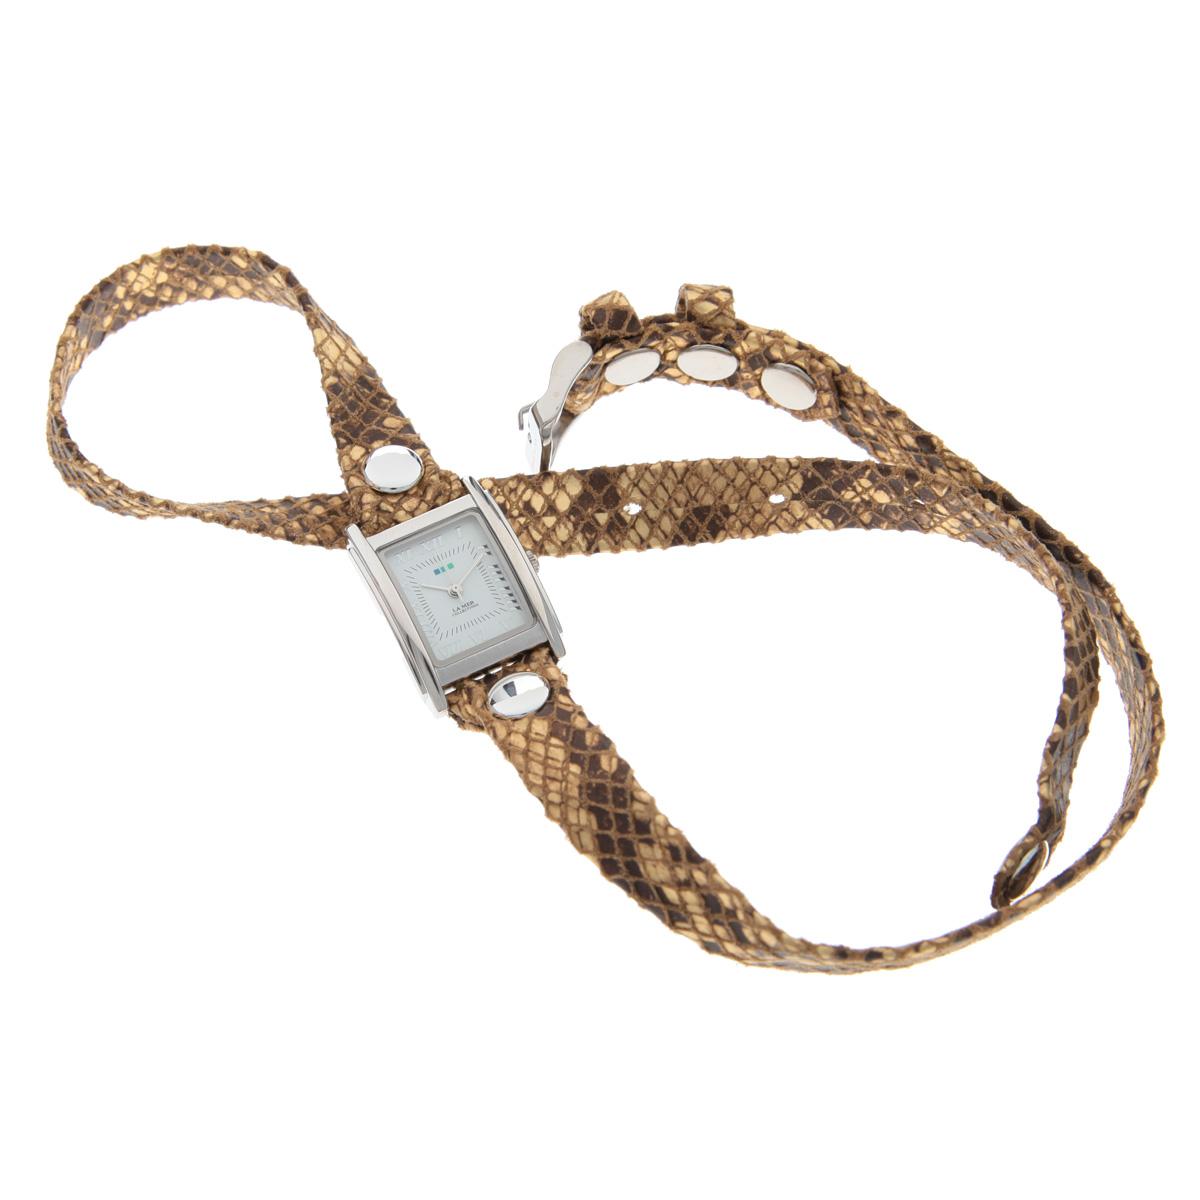 "Часы наручные женские La Mer Collections ""Simple Cobra Snake"". LMSTW6000x ( LMSTW6000x )"